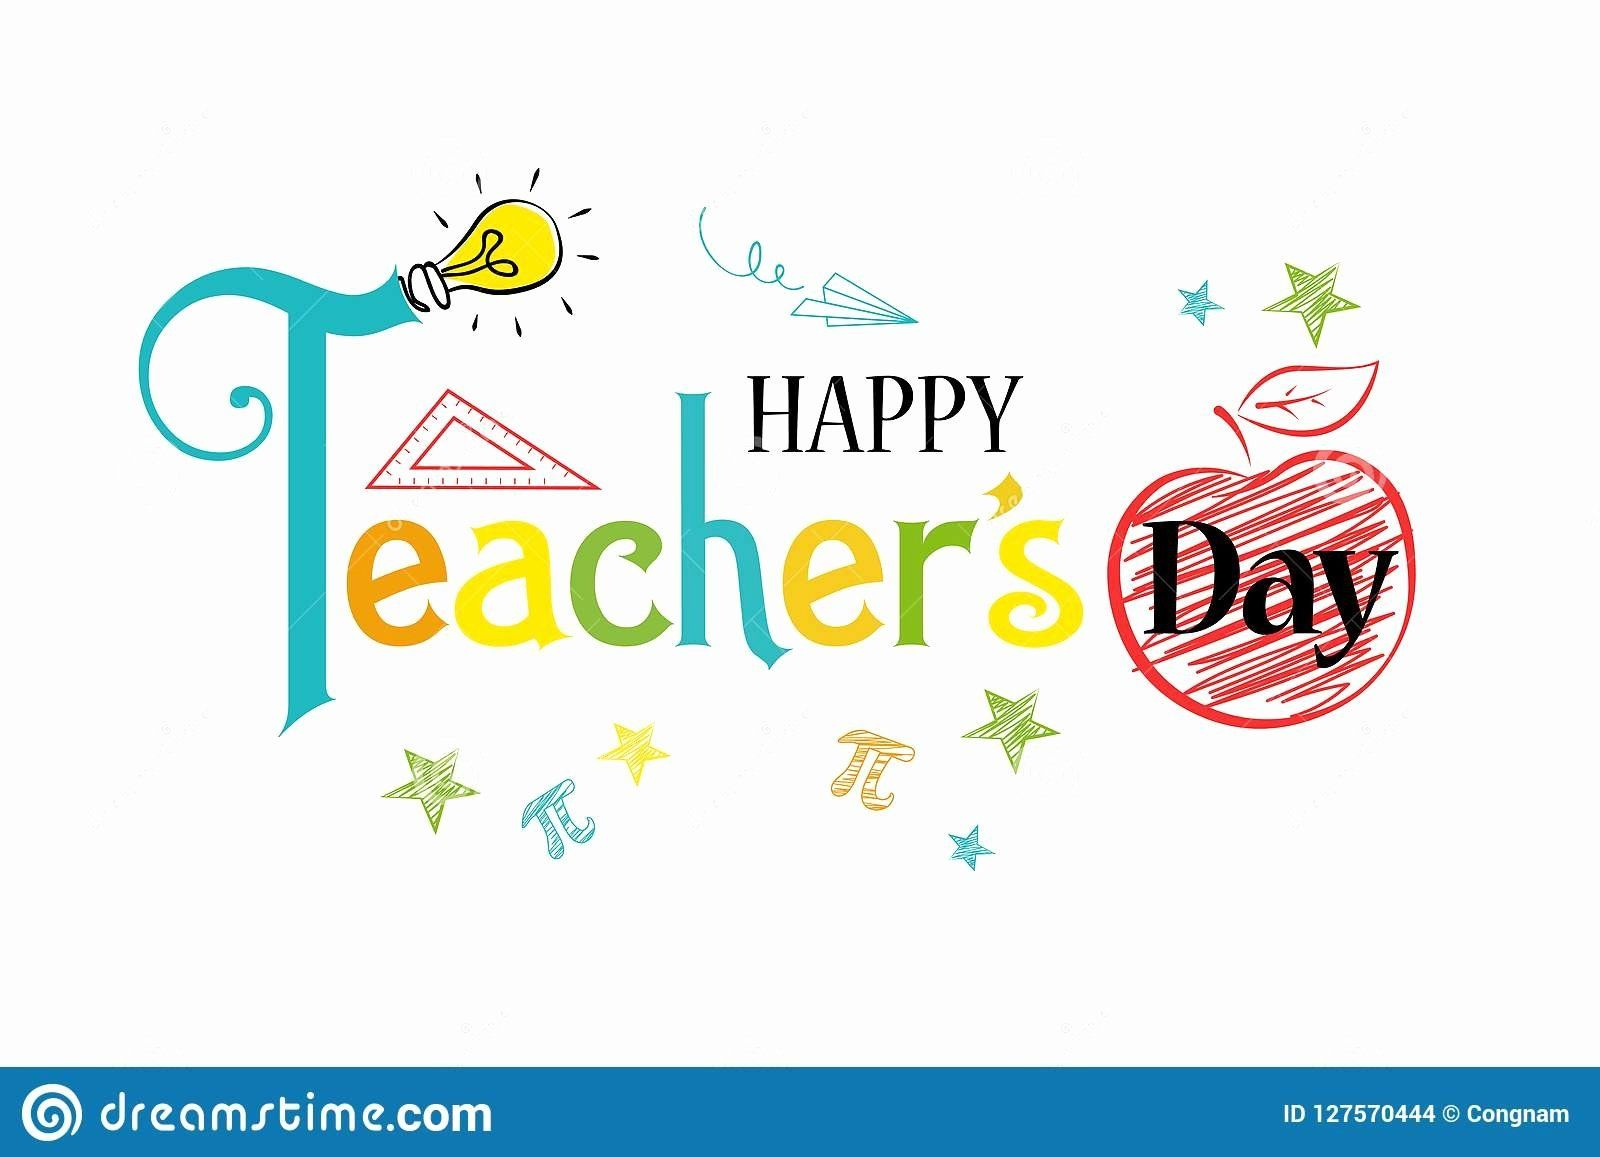 Teacher Days Card Lovely Teachers Day Invitation Card Sample Letter Bestkitchenview Co Teachers Day Card Letter For Teachers Day Letter To Teacher